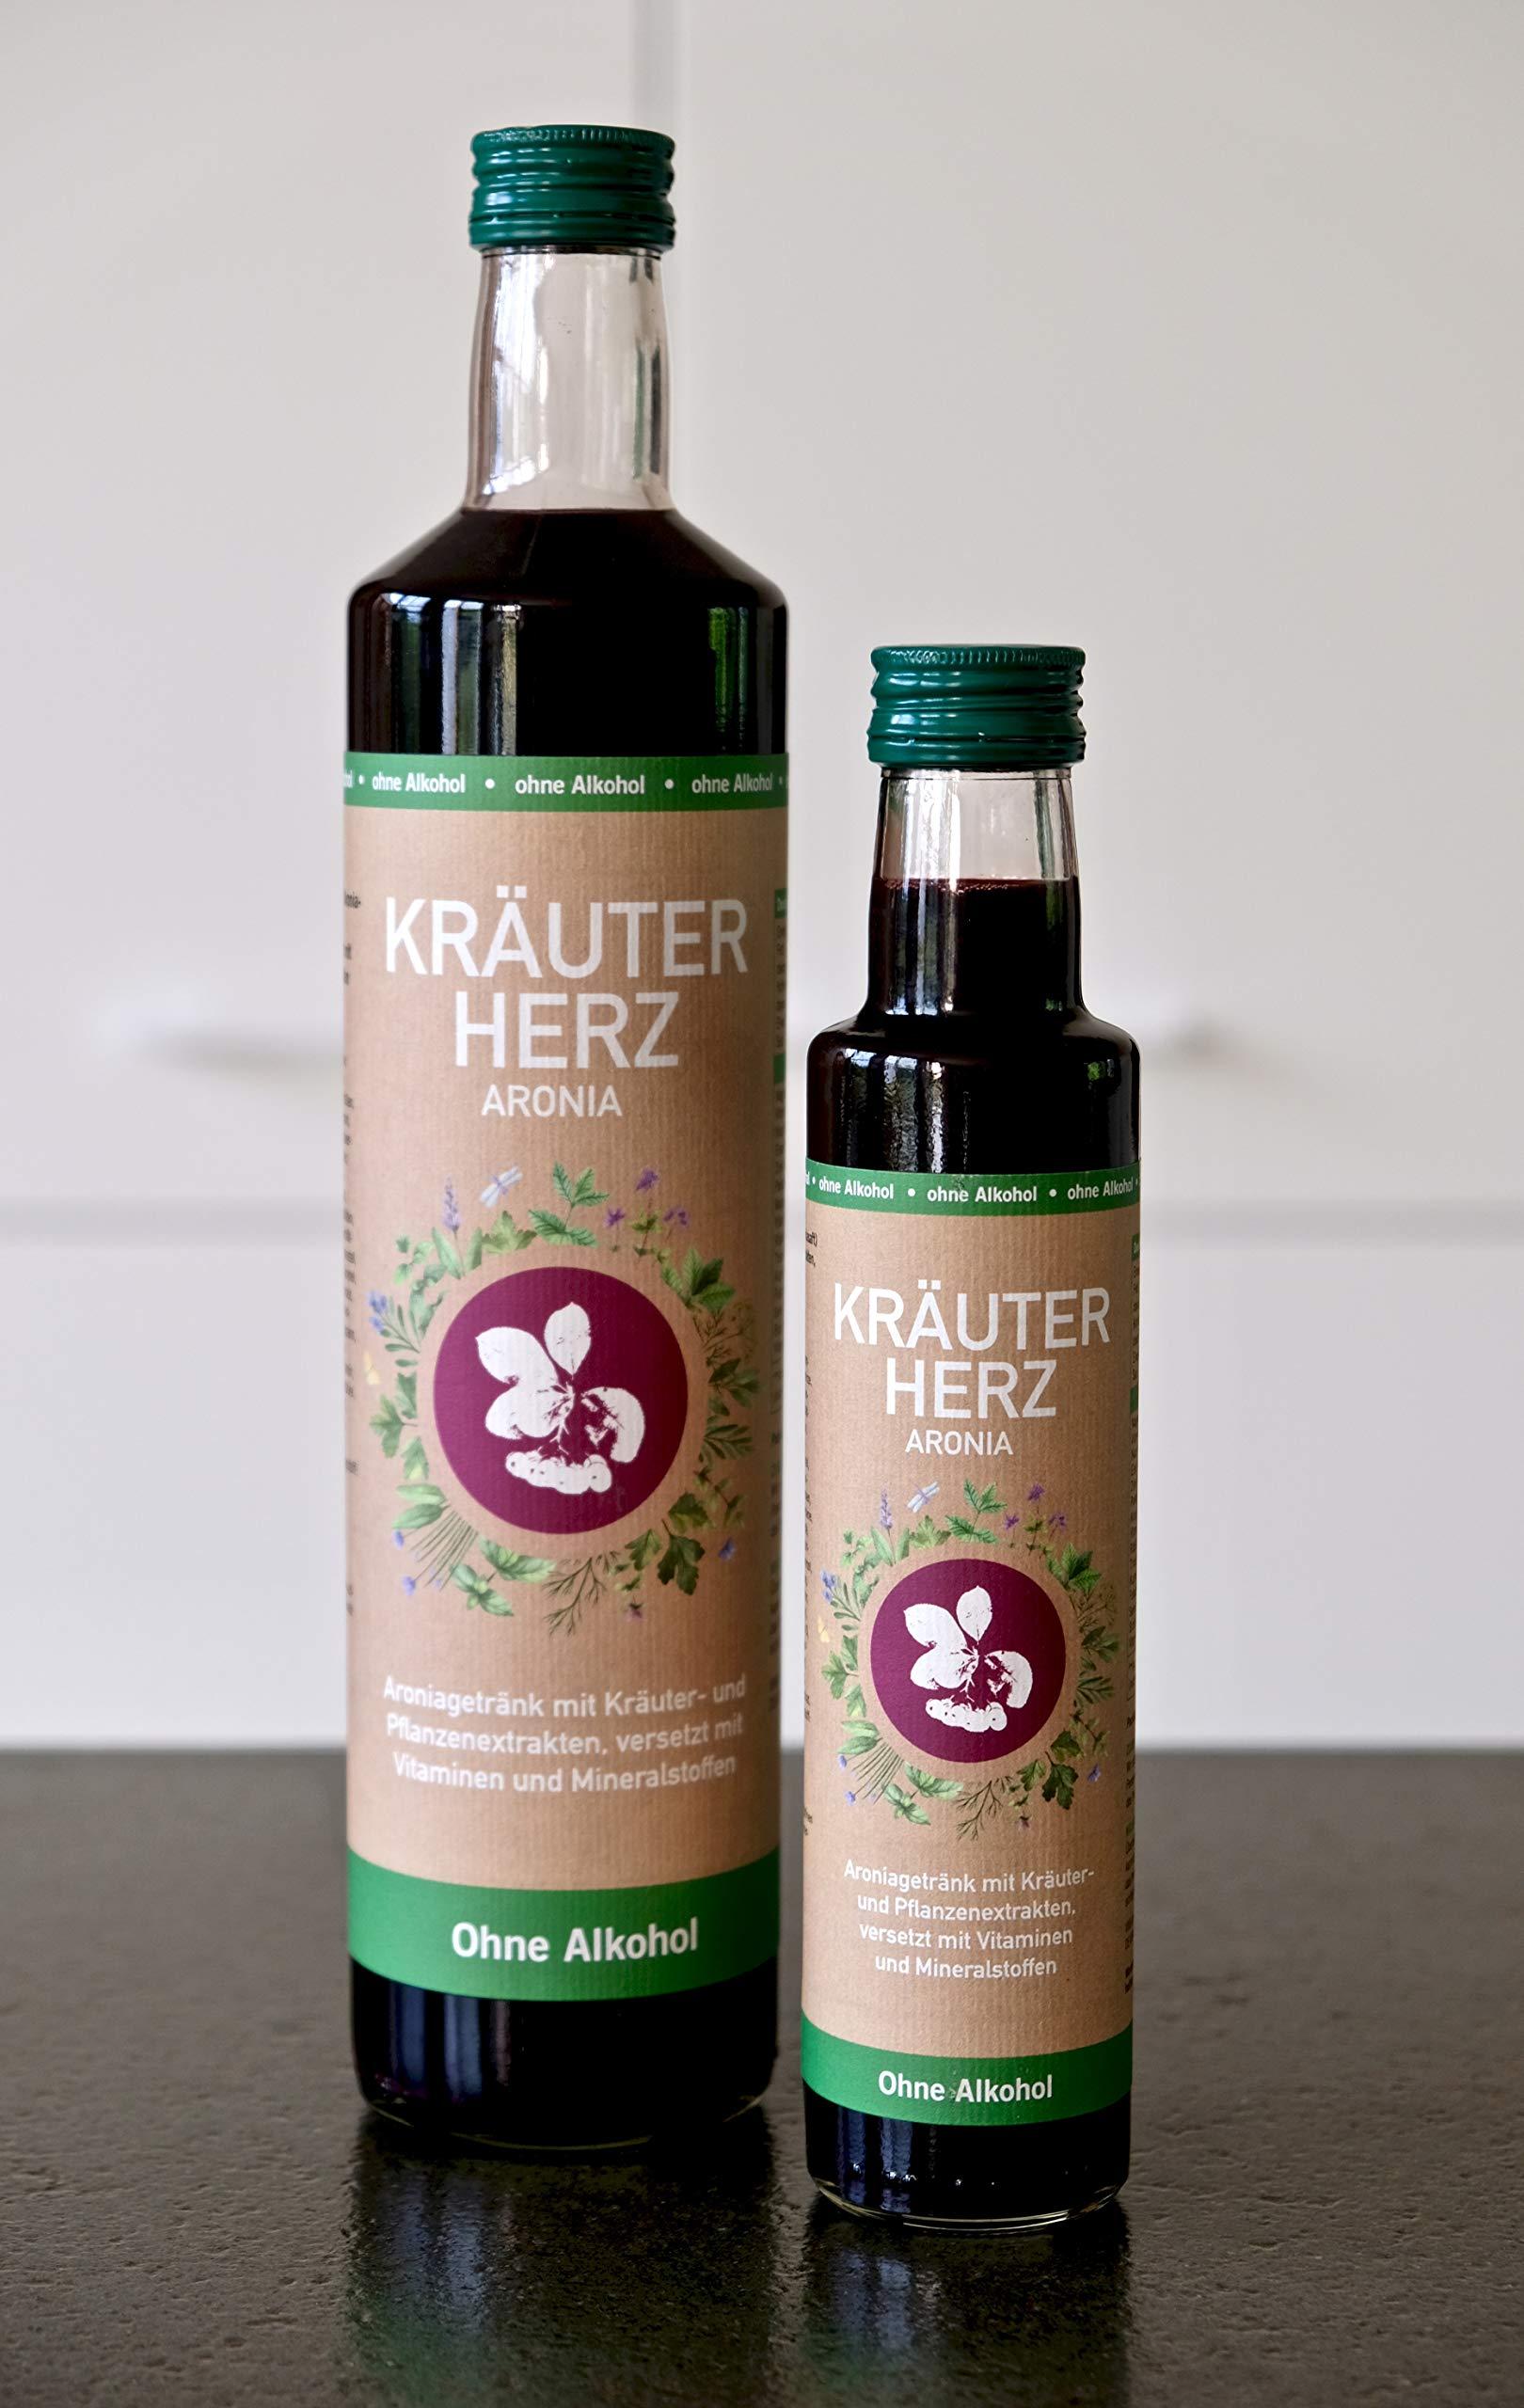 BIO-Aroniasaft-mit-40-Krutern-750ml-starkes-Immunsystem-Kur-Superfood-hergestellt-in-Bayern